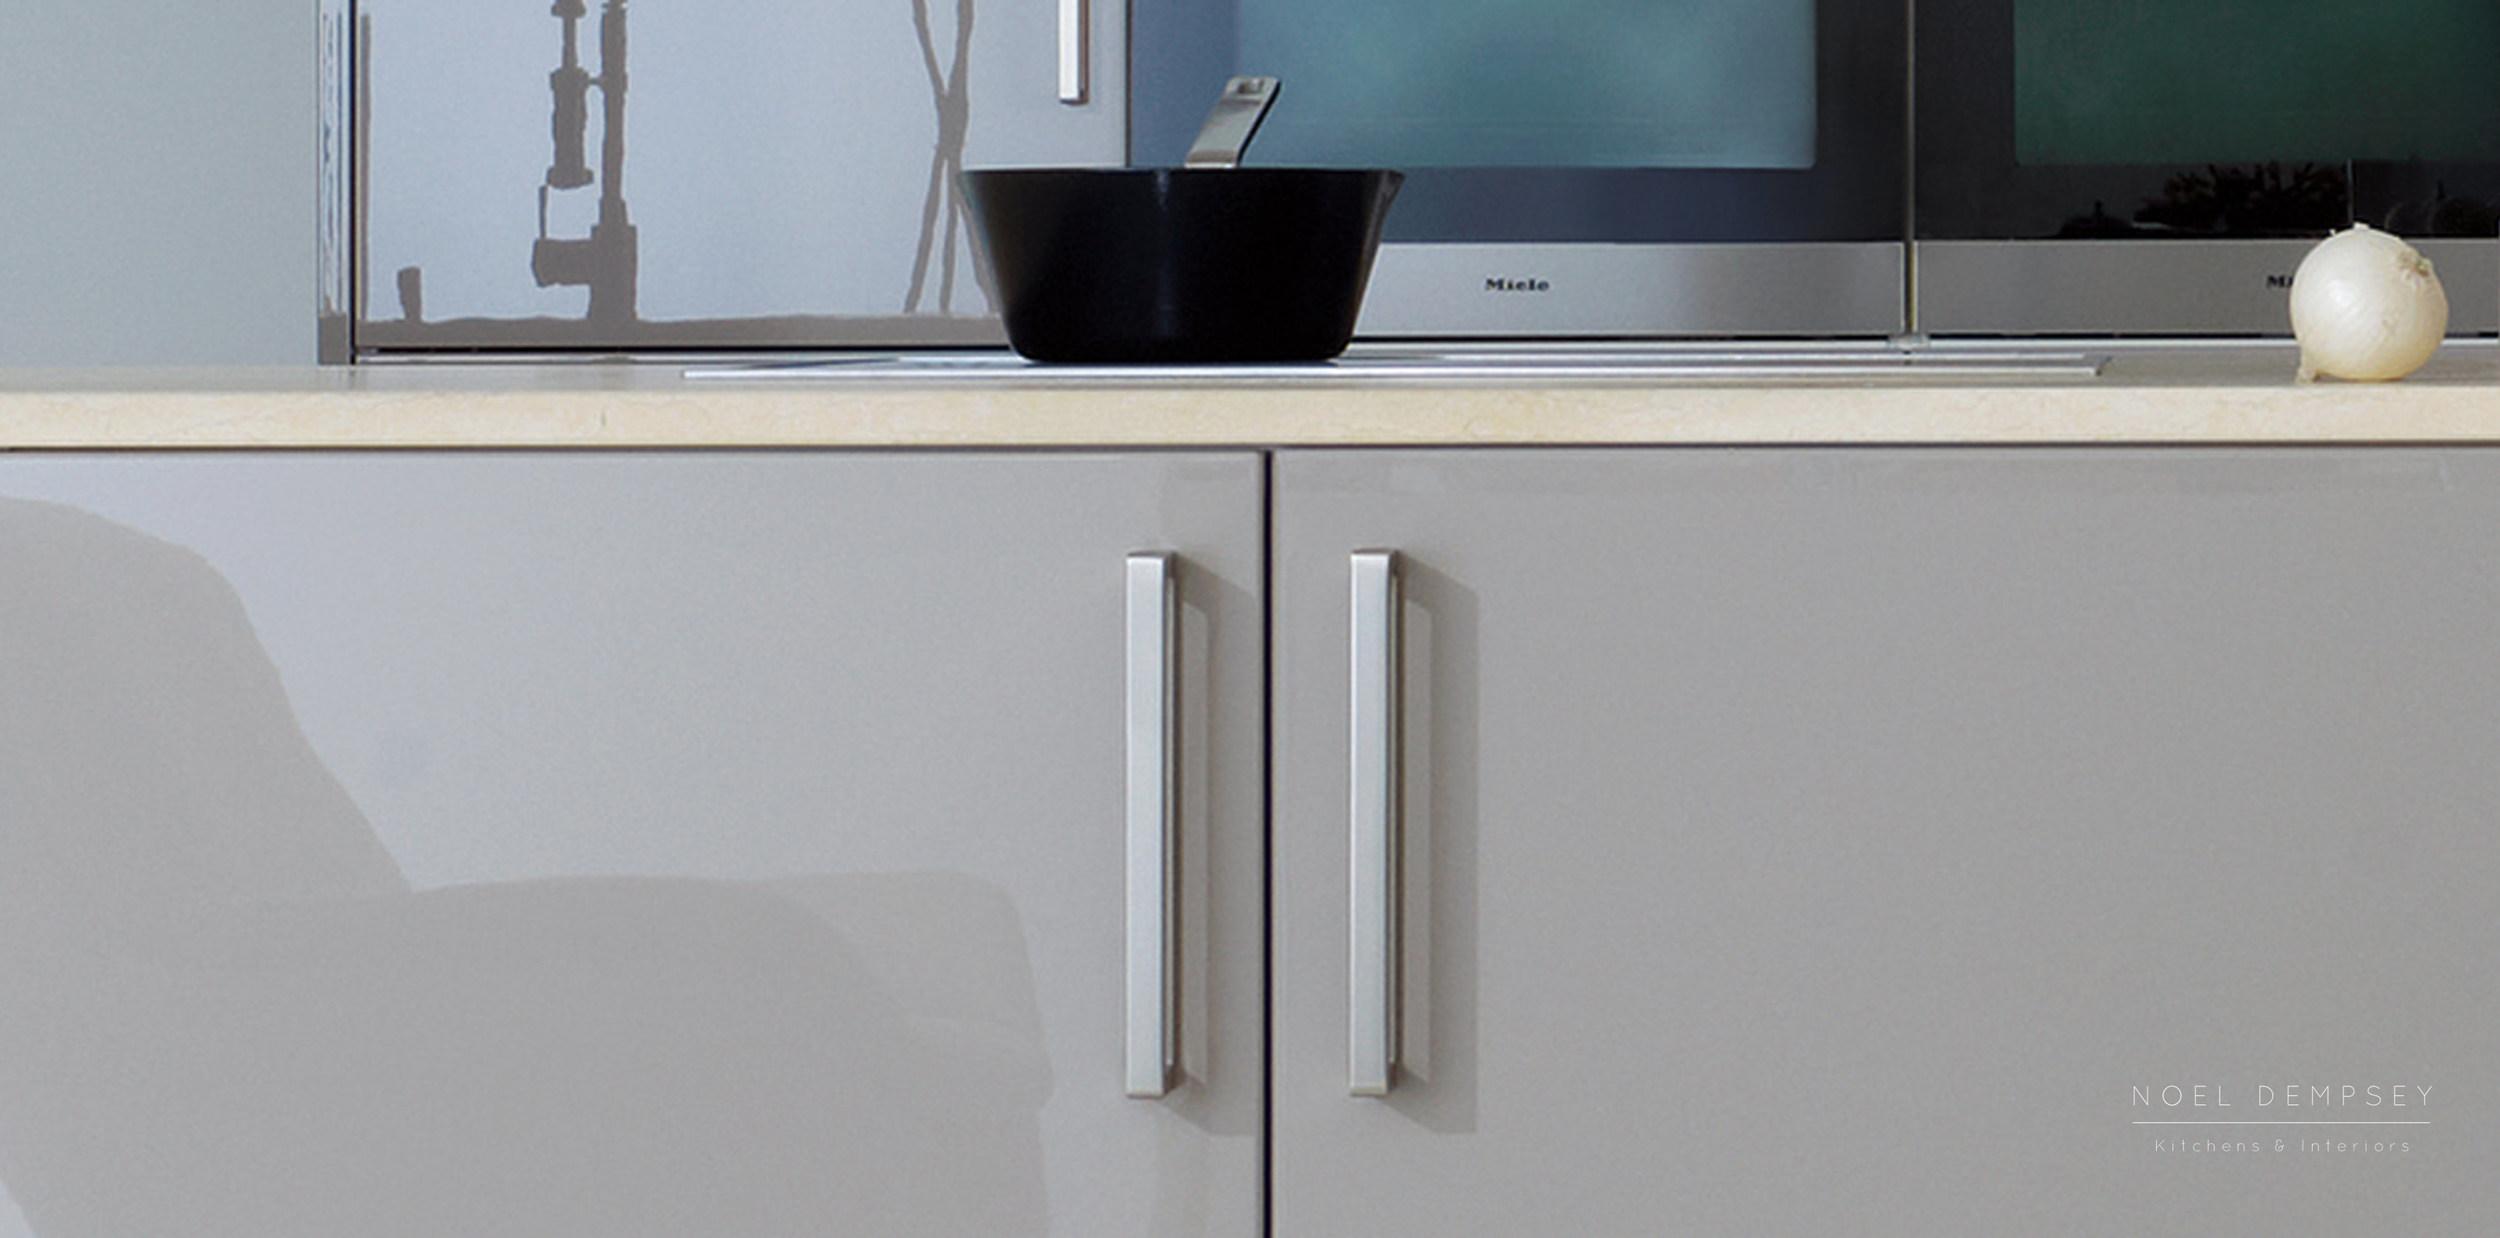 NX501-Truffle-High-Gloss-German-Kitchen-3.jpg